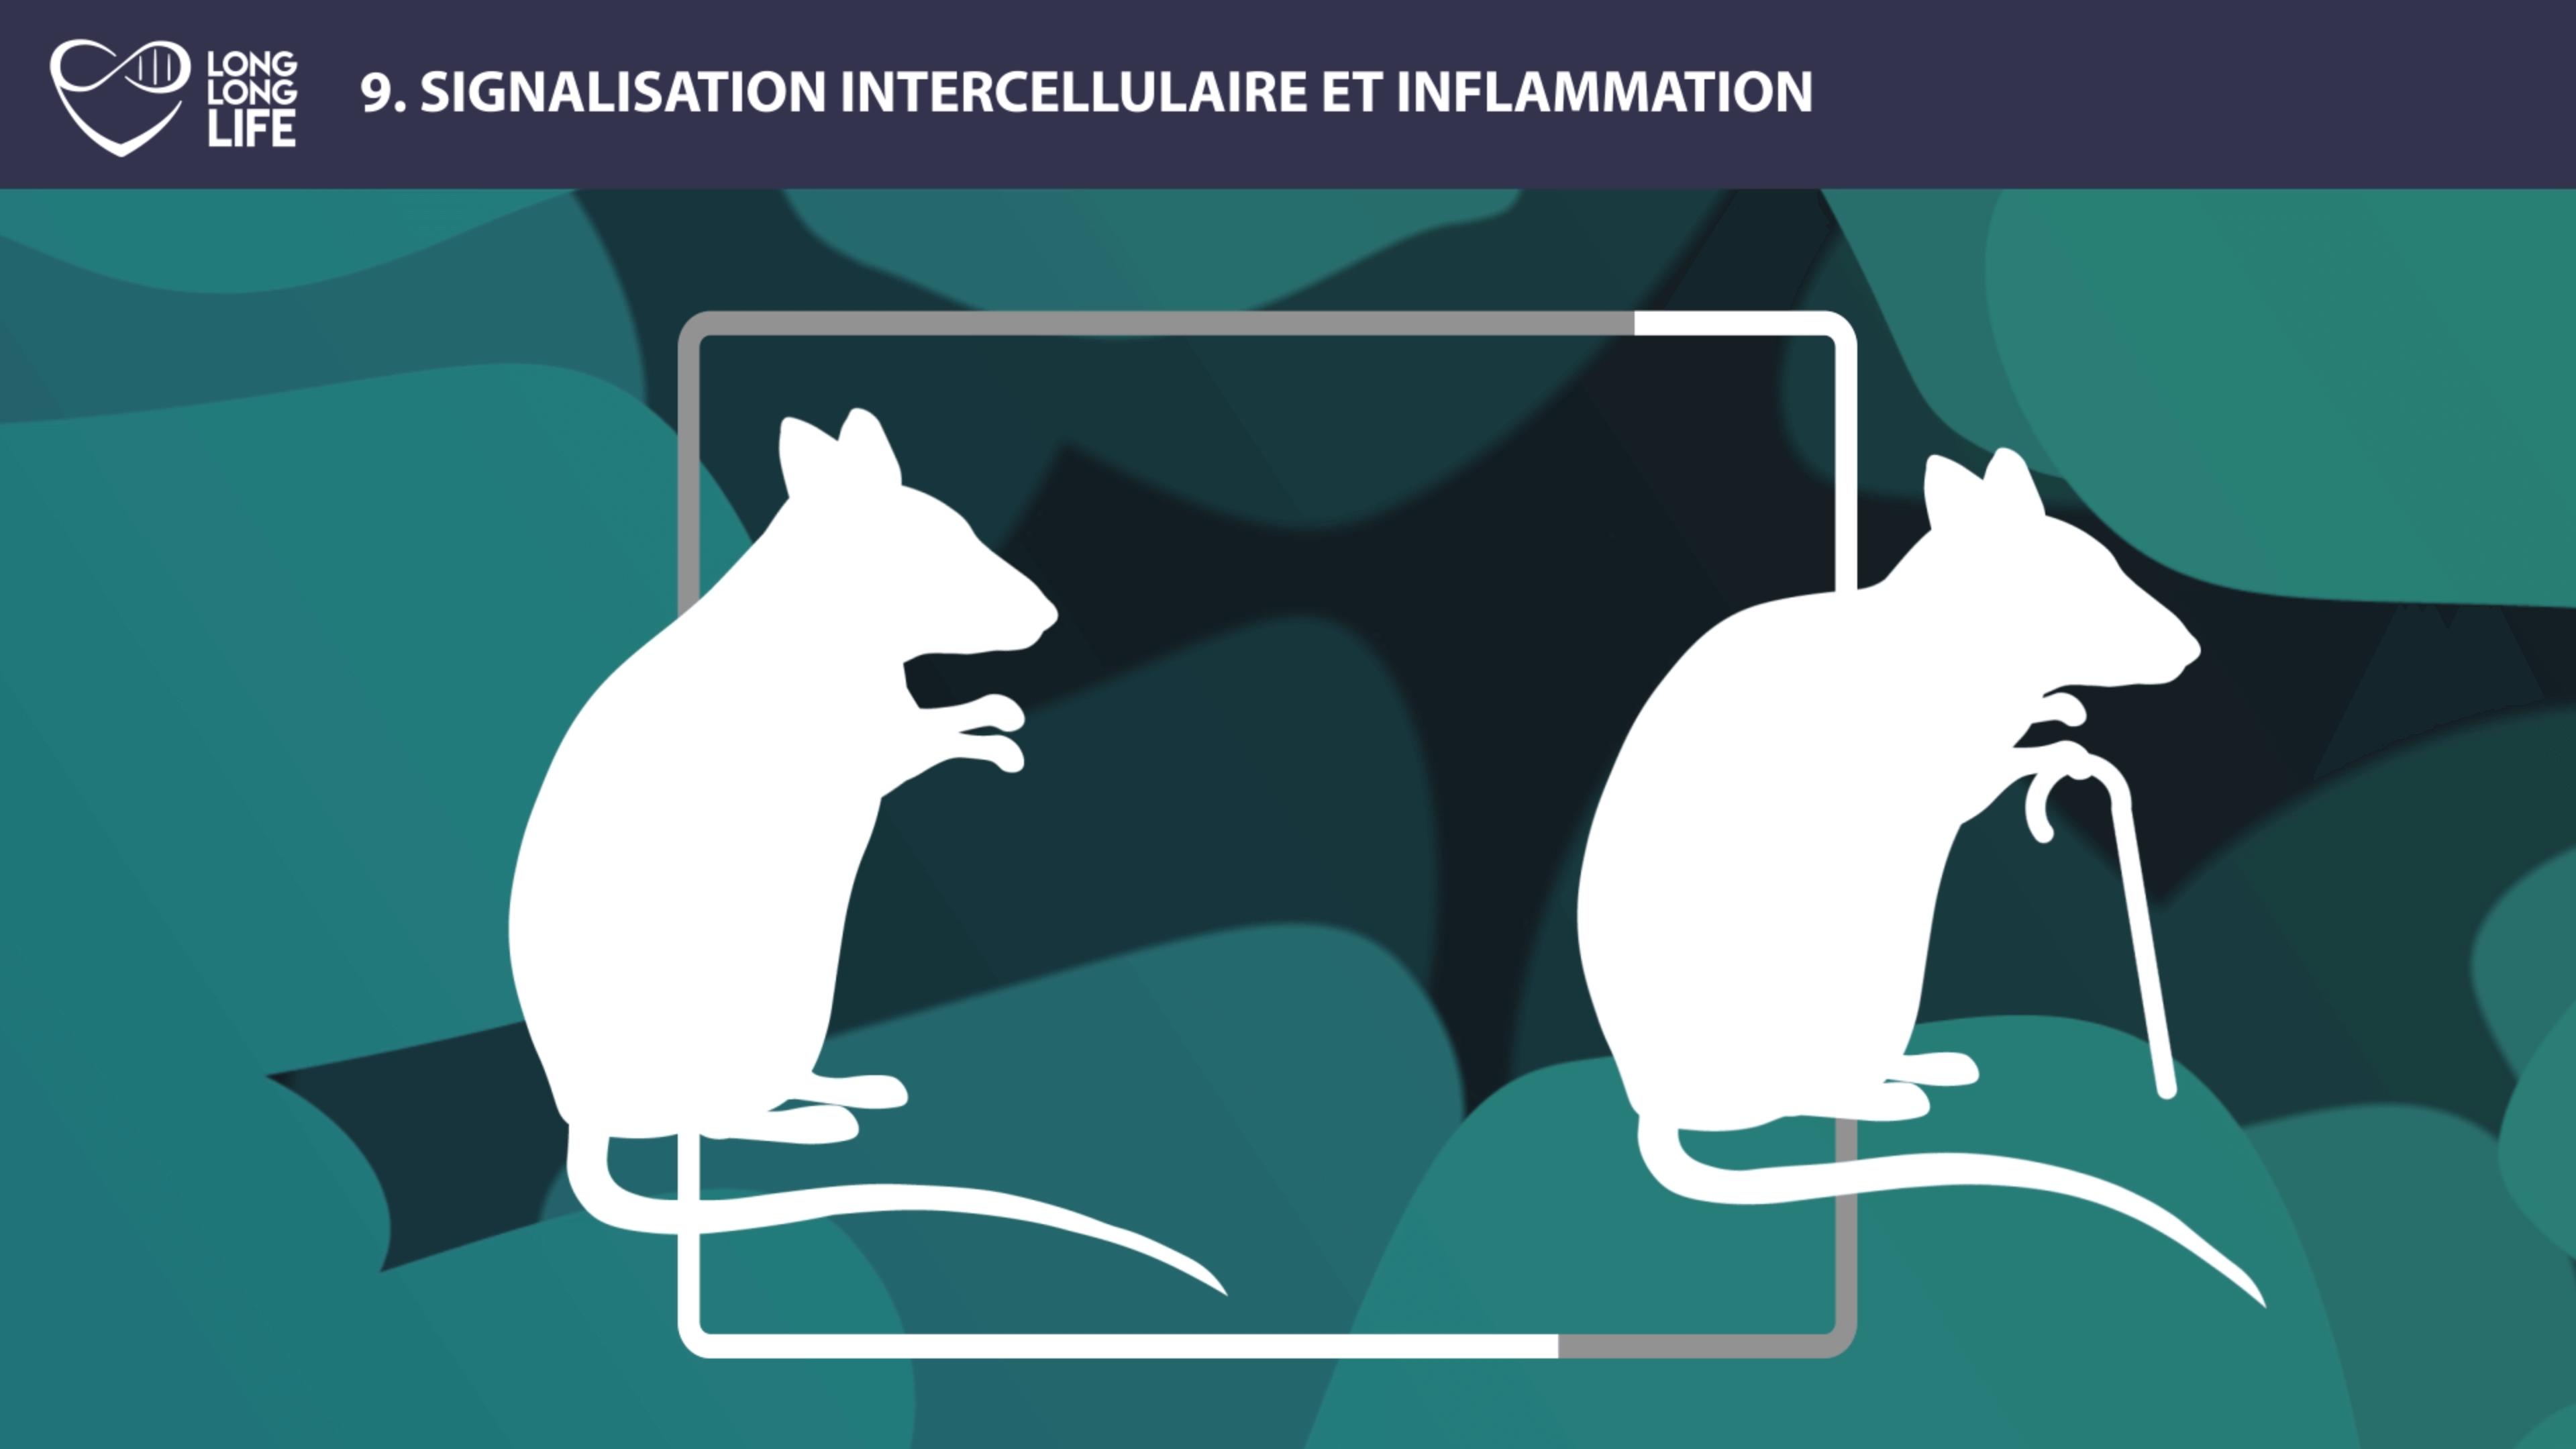 Inflammation Long Long Life longevity aging transhumism parabiosis